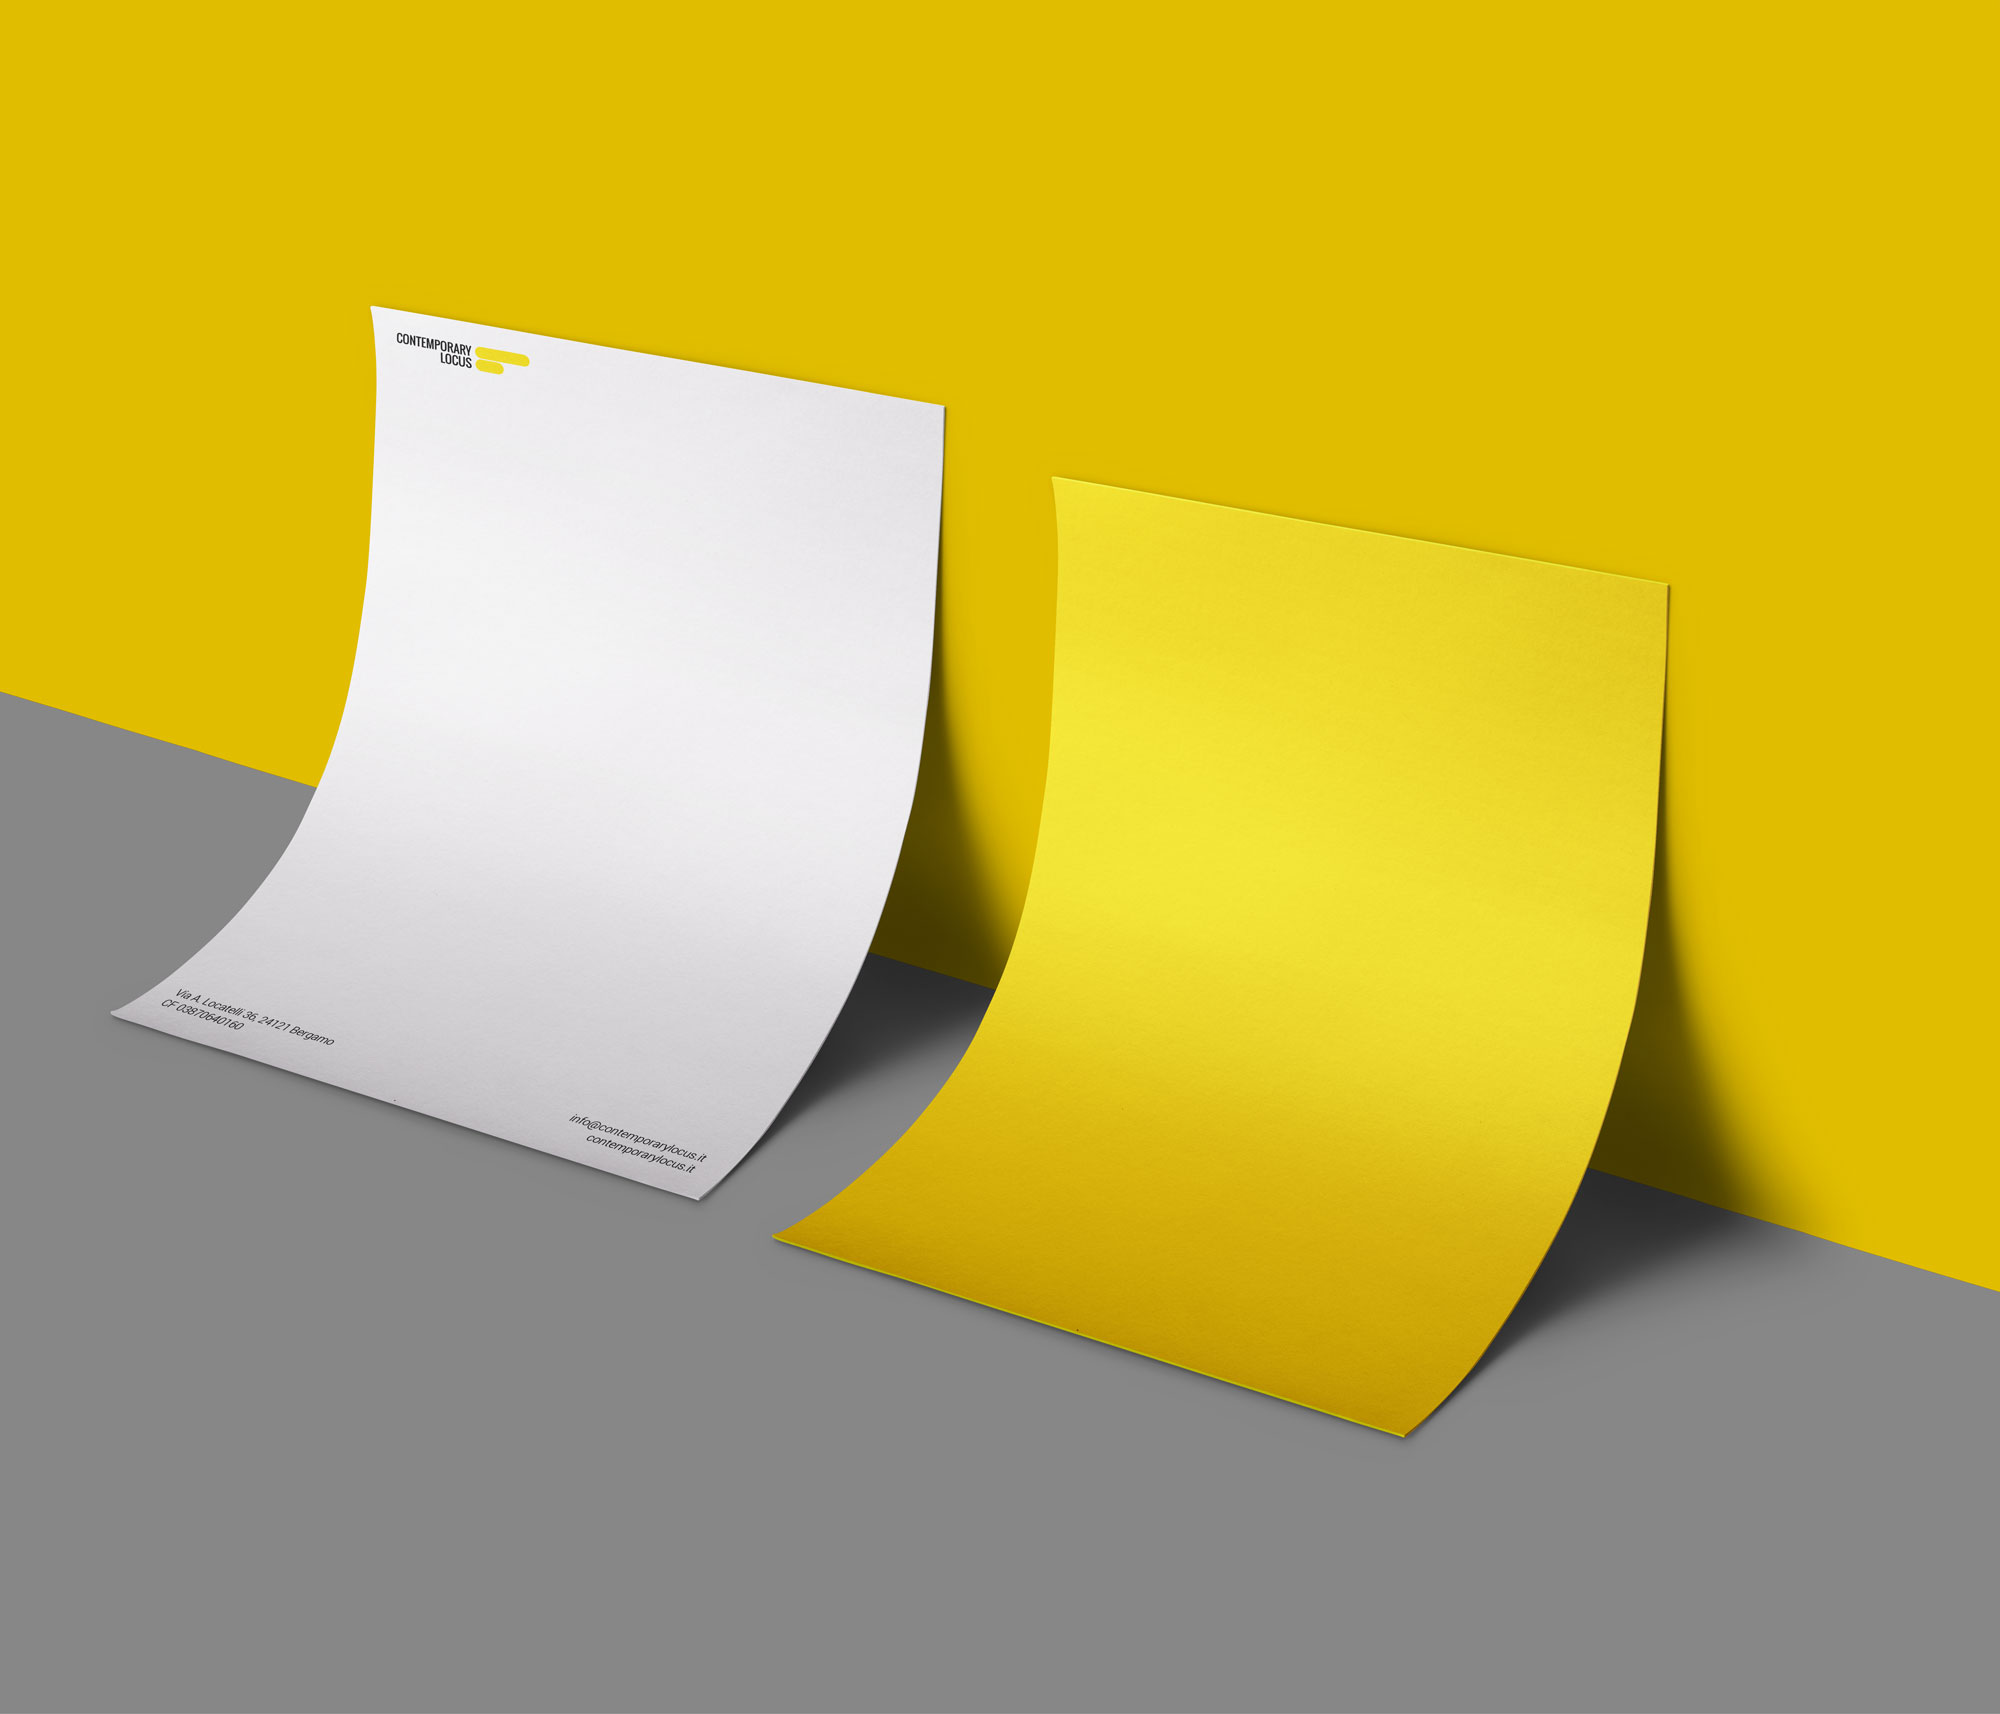 Letter-Paper-Brand-Mockup-02